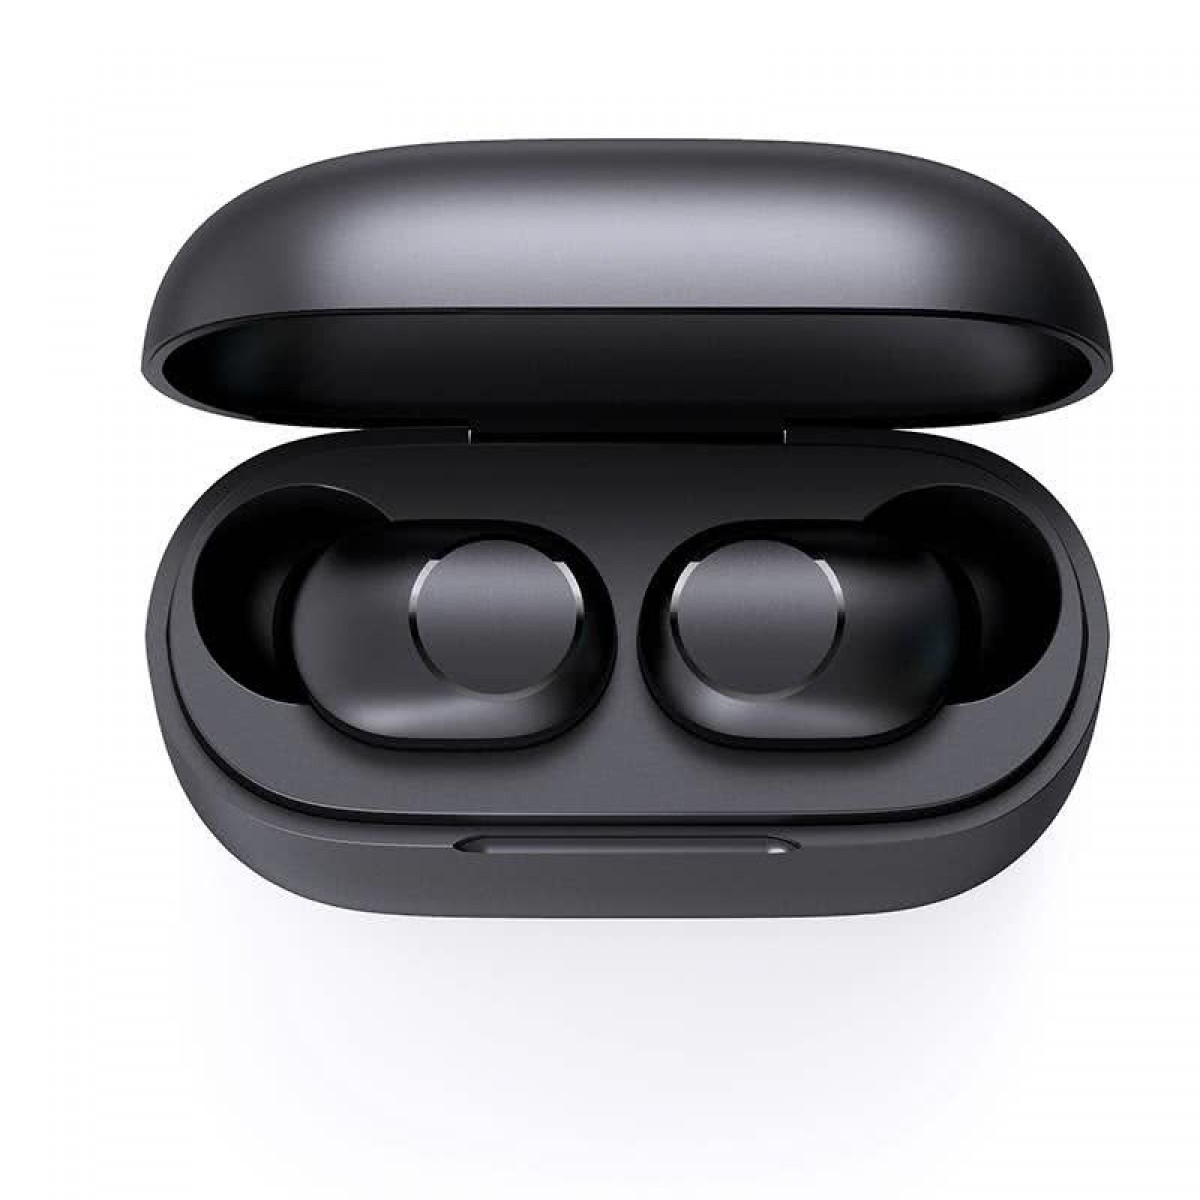 Fone de Ouvido Bluetooth Xiaomi HAYLOU GT5, Black